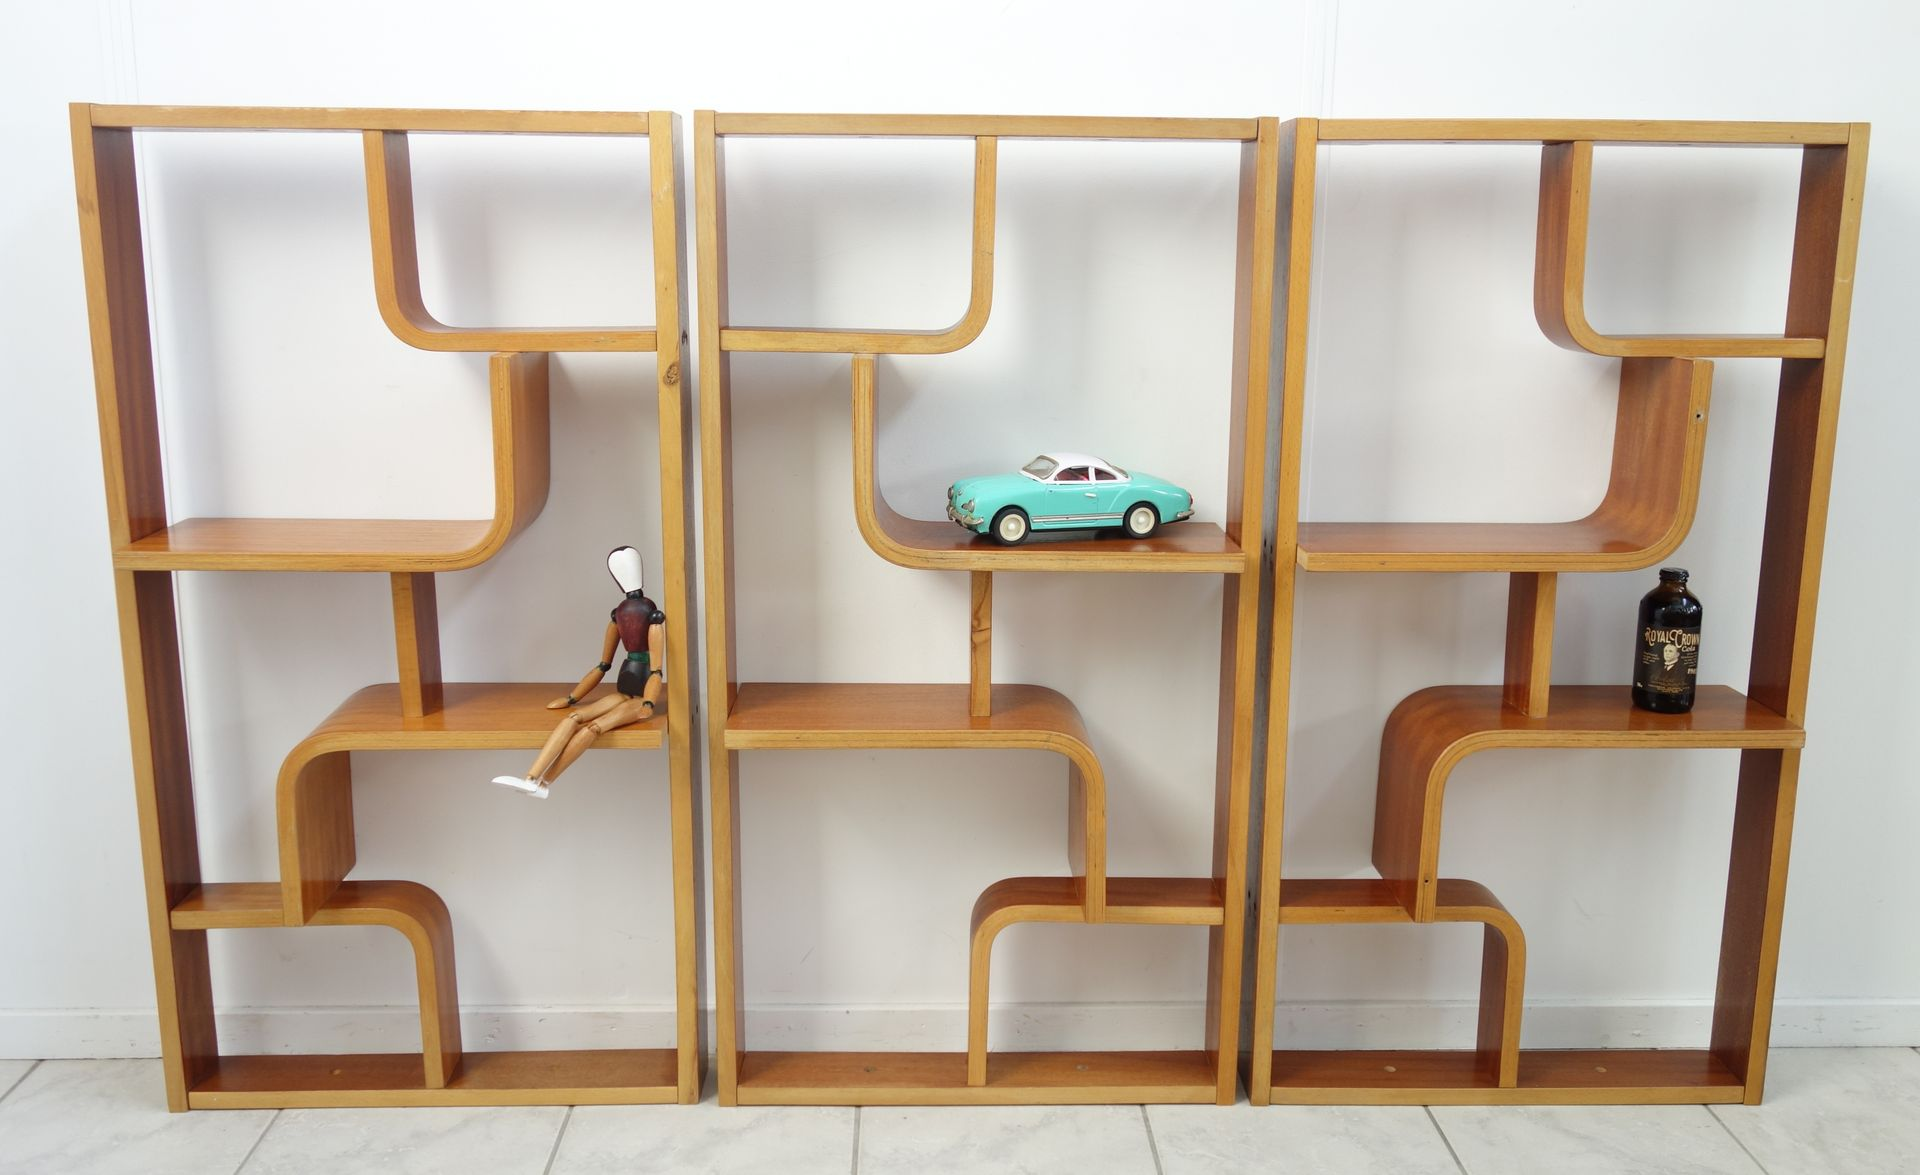 Shelving Unit Or Room Divider By Ludvik Volak For Drevopodnik